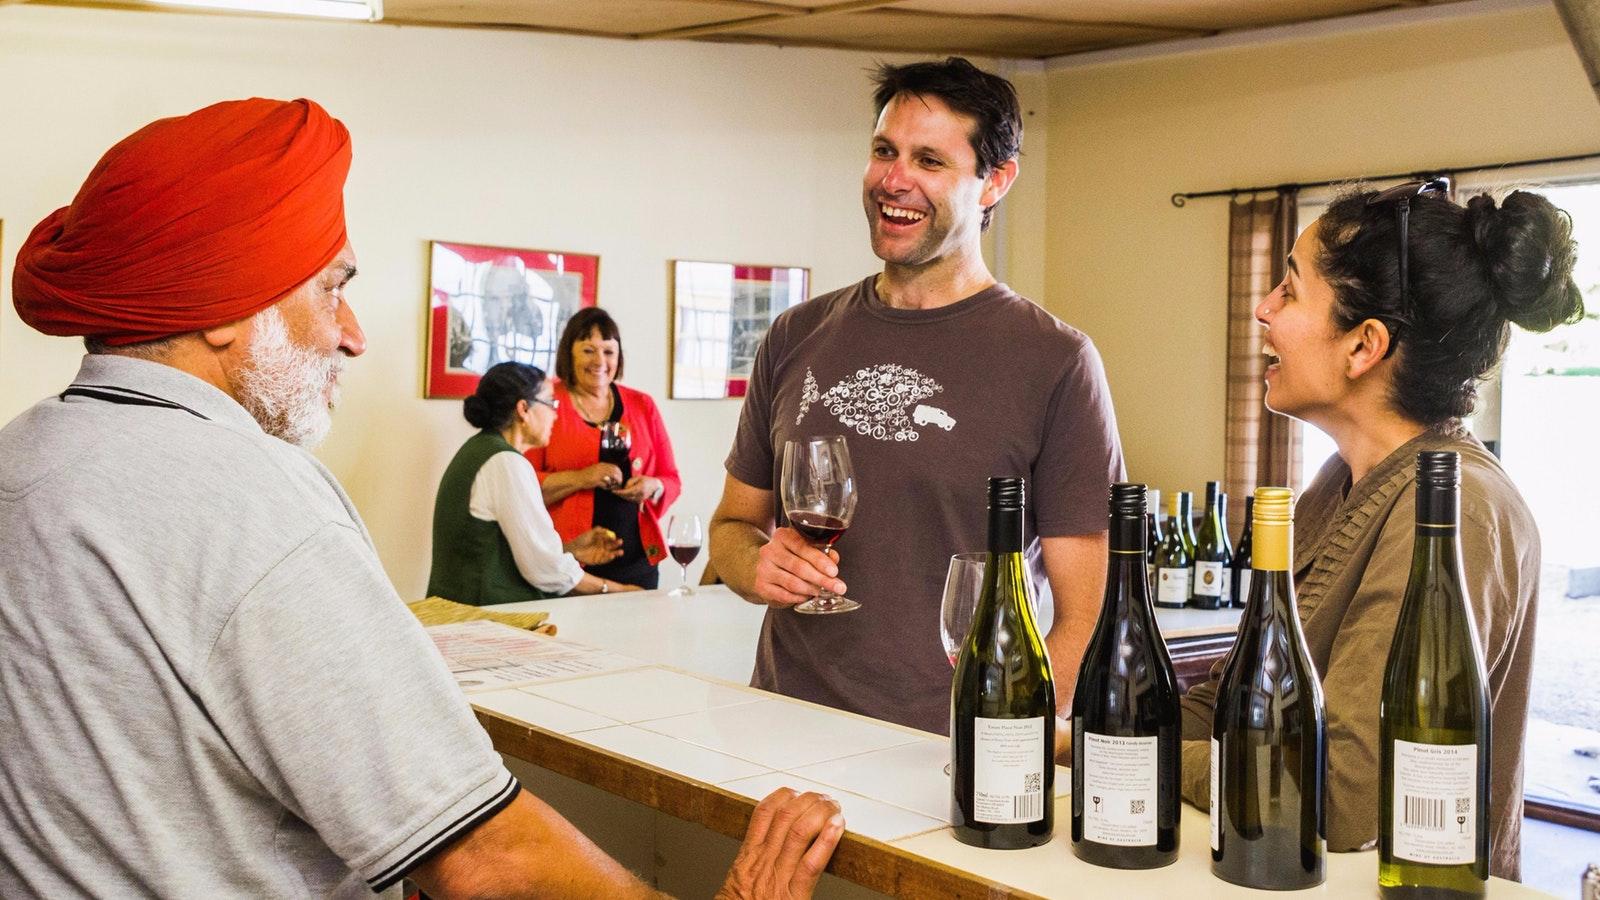 Cellar Door wine tasting at Nazaaray Estate Winery